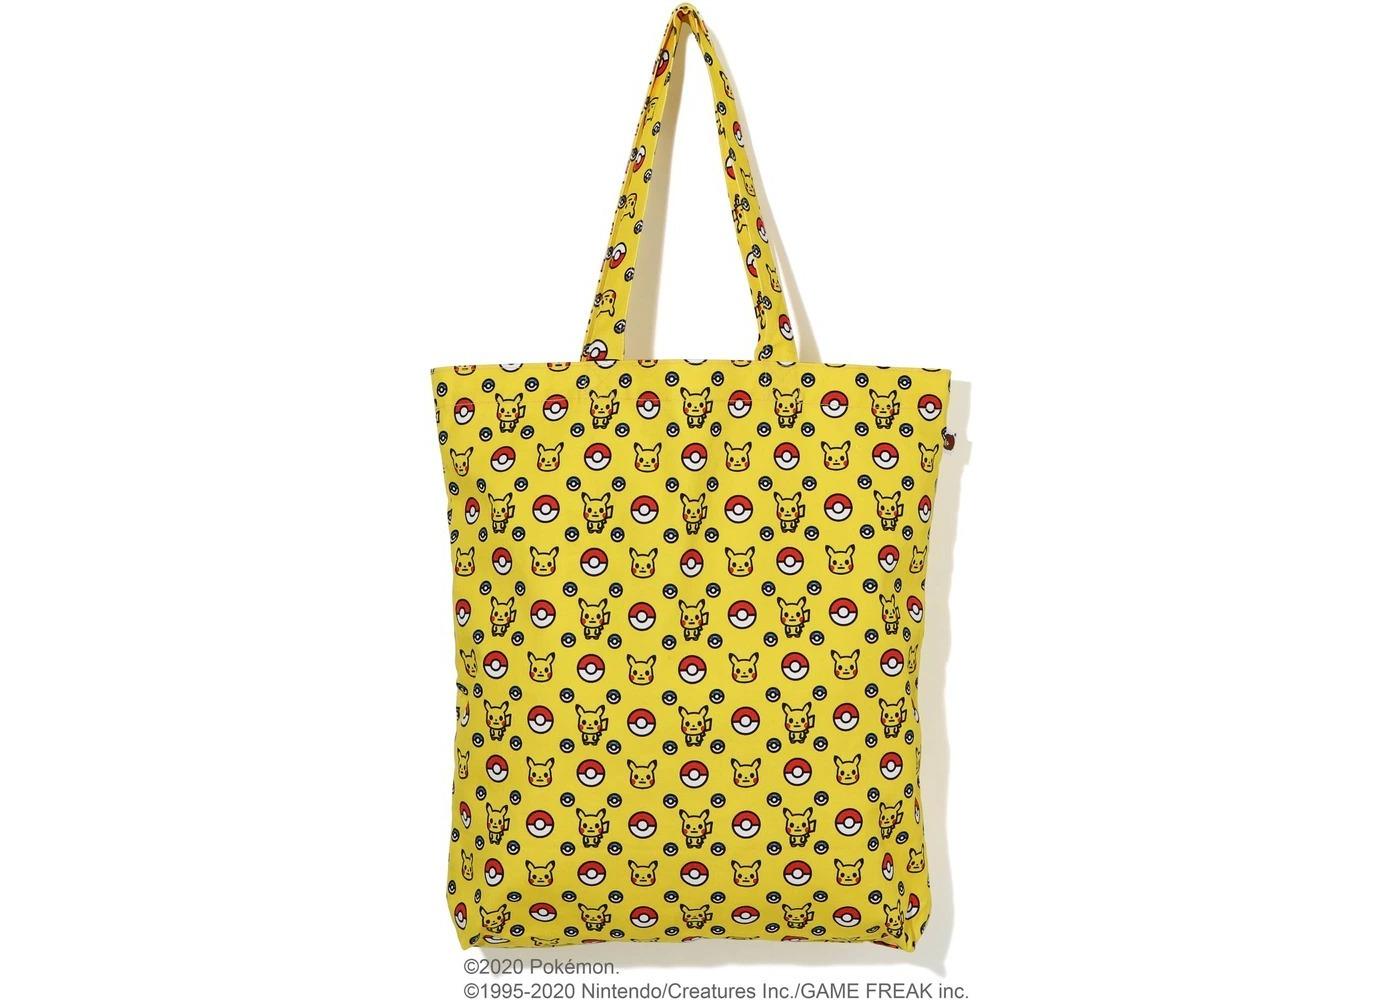 Bape x Pokemon Tote Bag Yellow (FW20)の写真